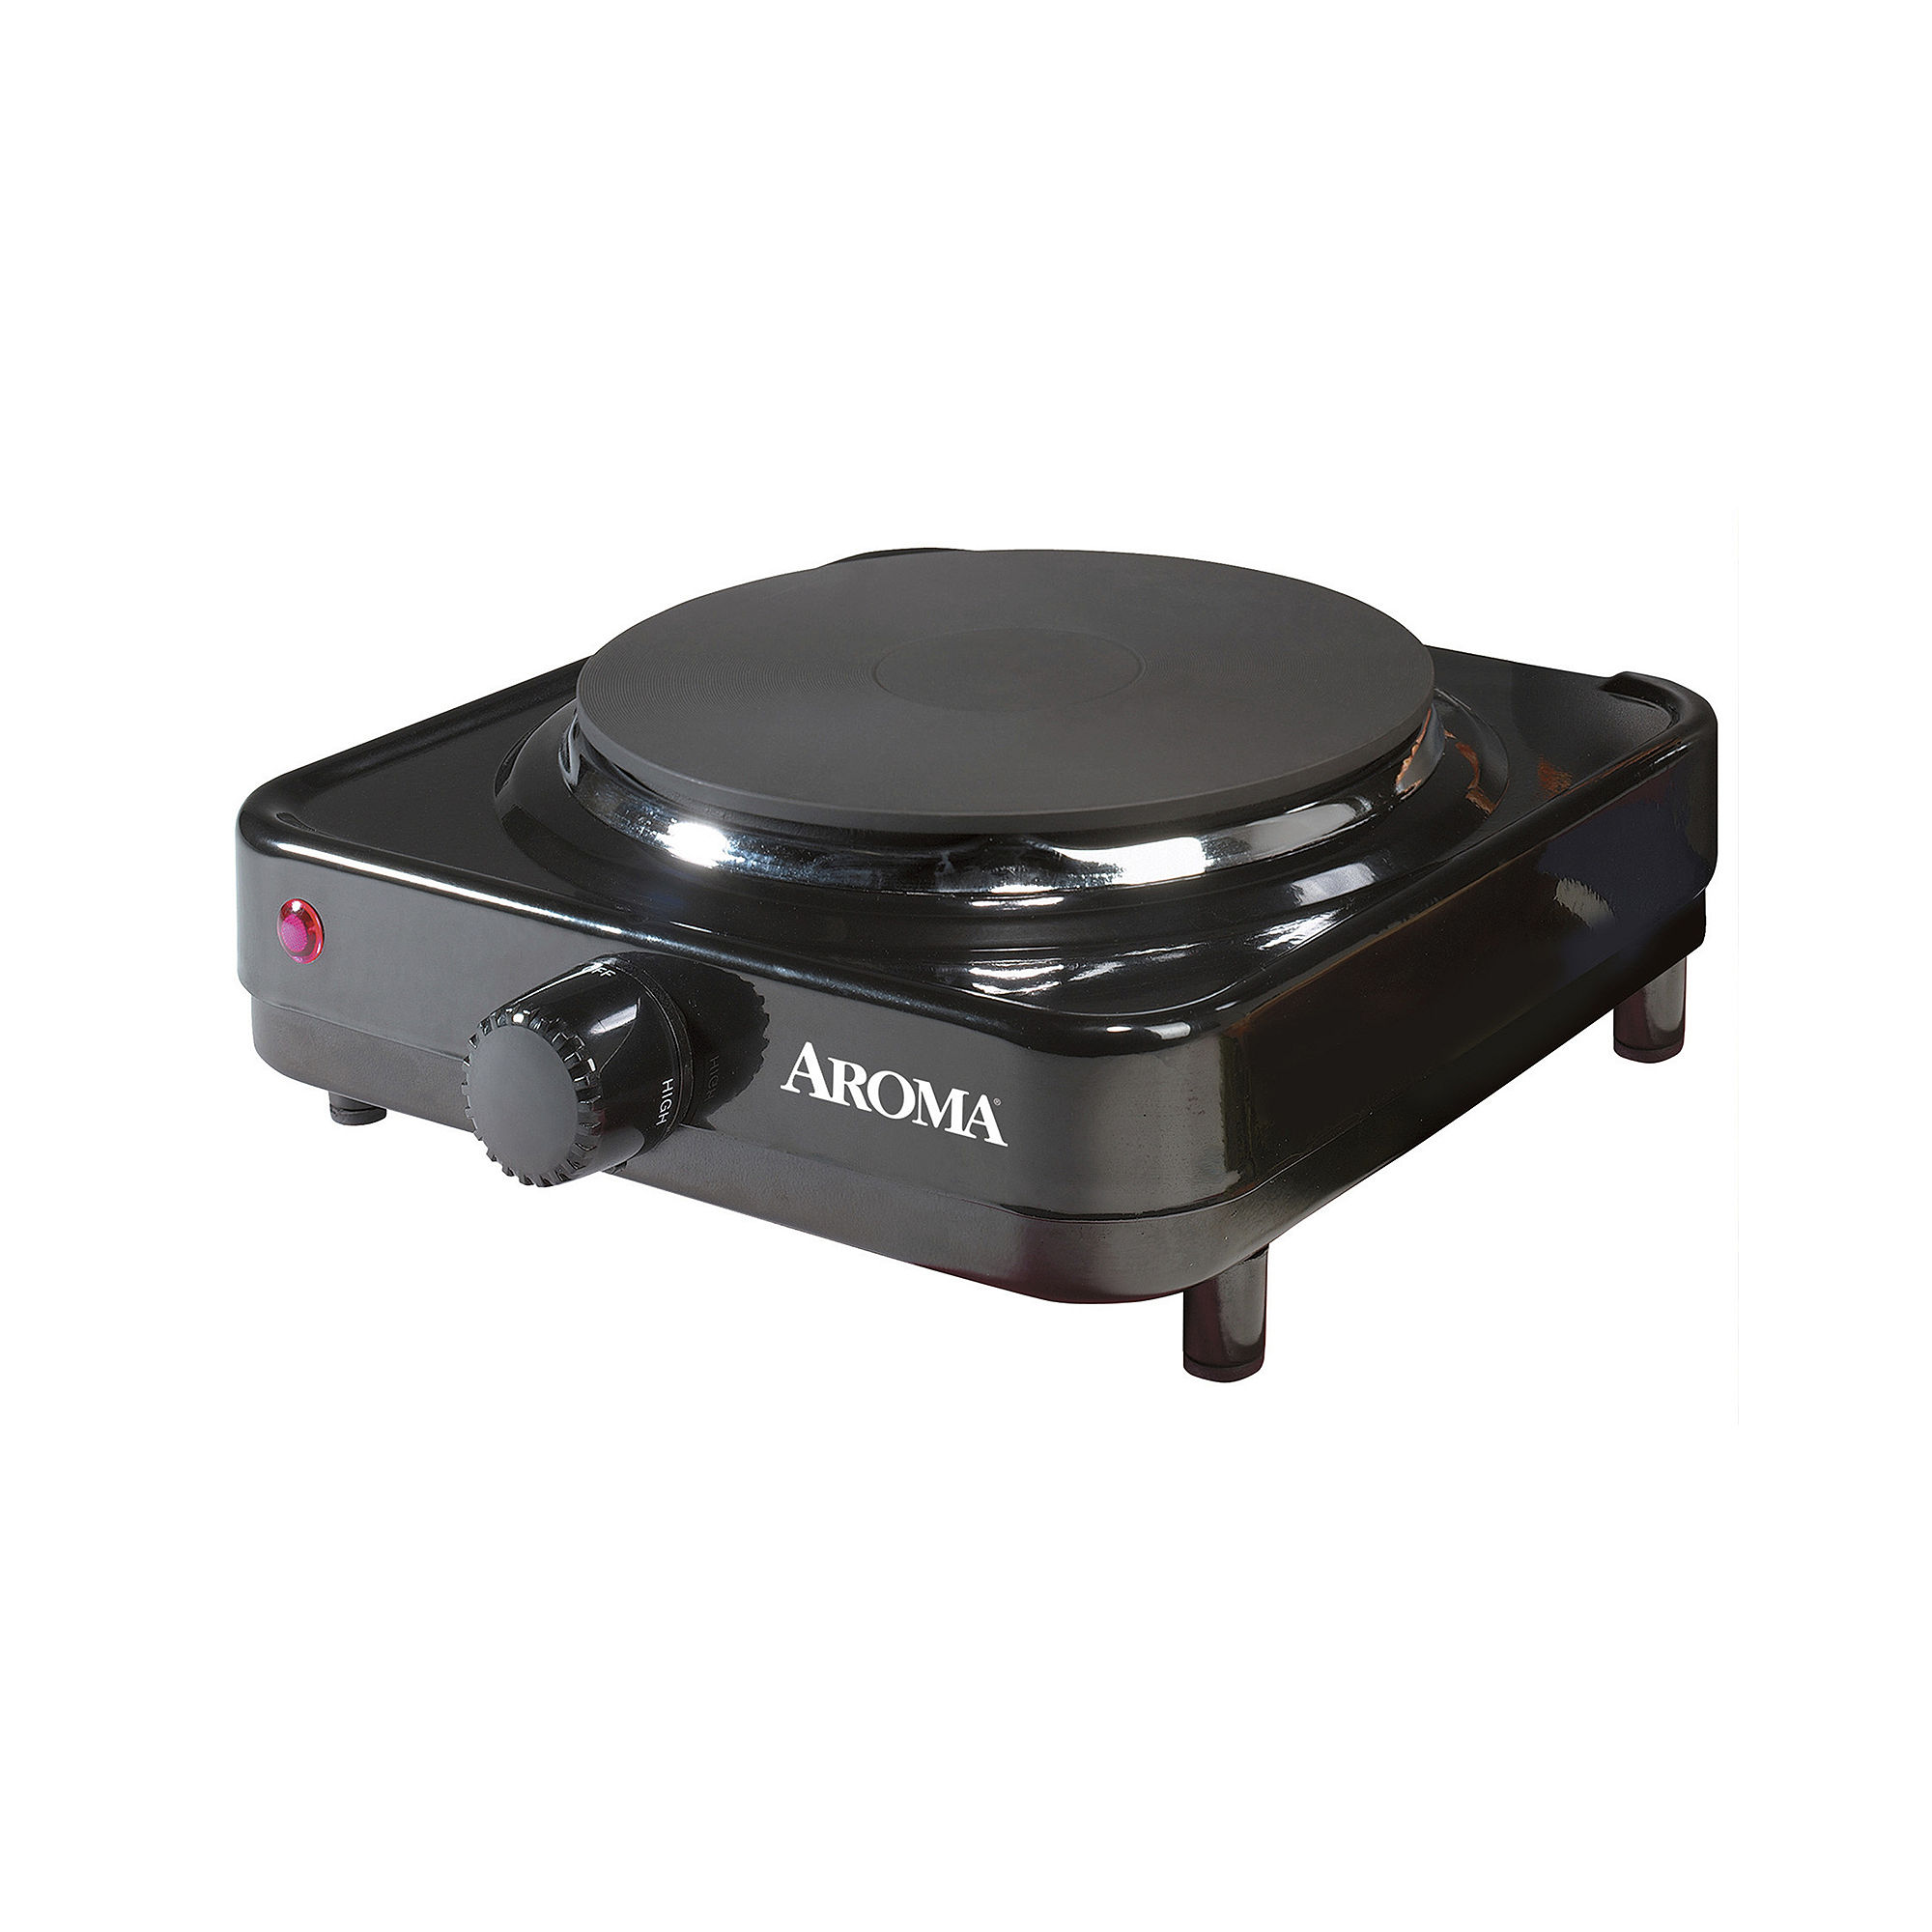 Aroma AHP-303 Single Burner Hot Plate